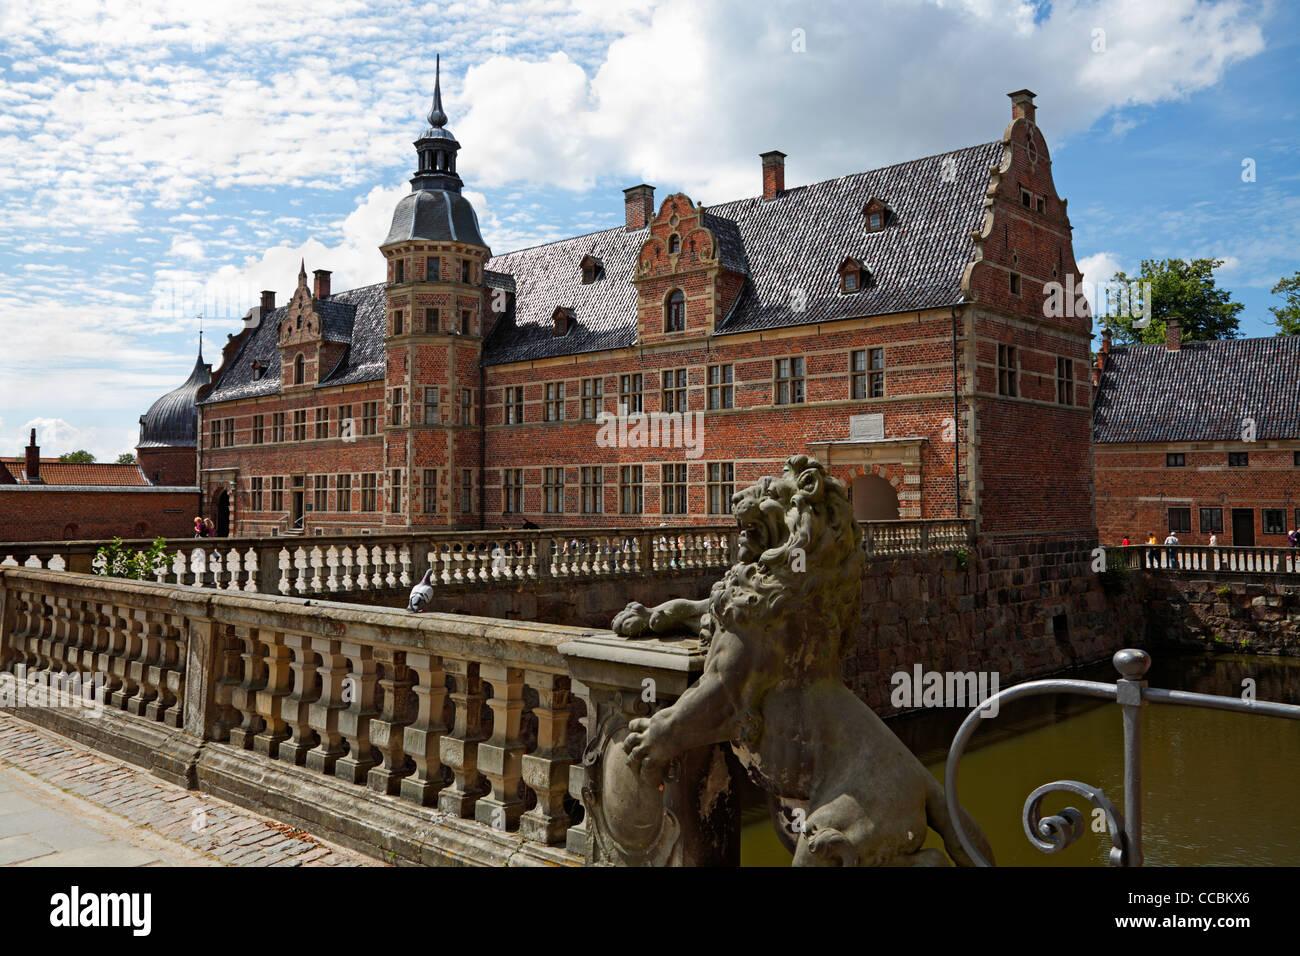 The Frederiksborg Castle in Dutch Renaissance style and the bridge over the moat in Hillerød near Copenhagen, Denmark Stock Photo